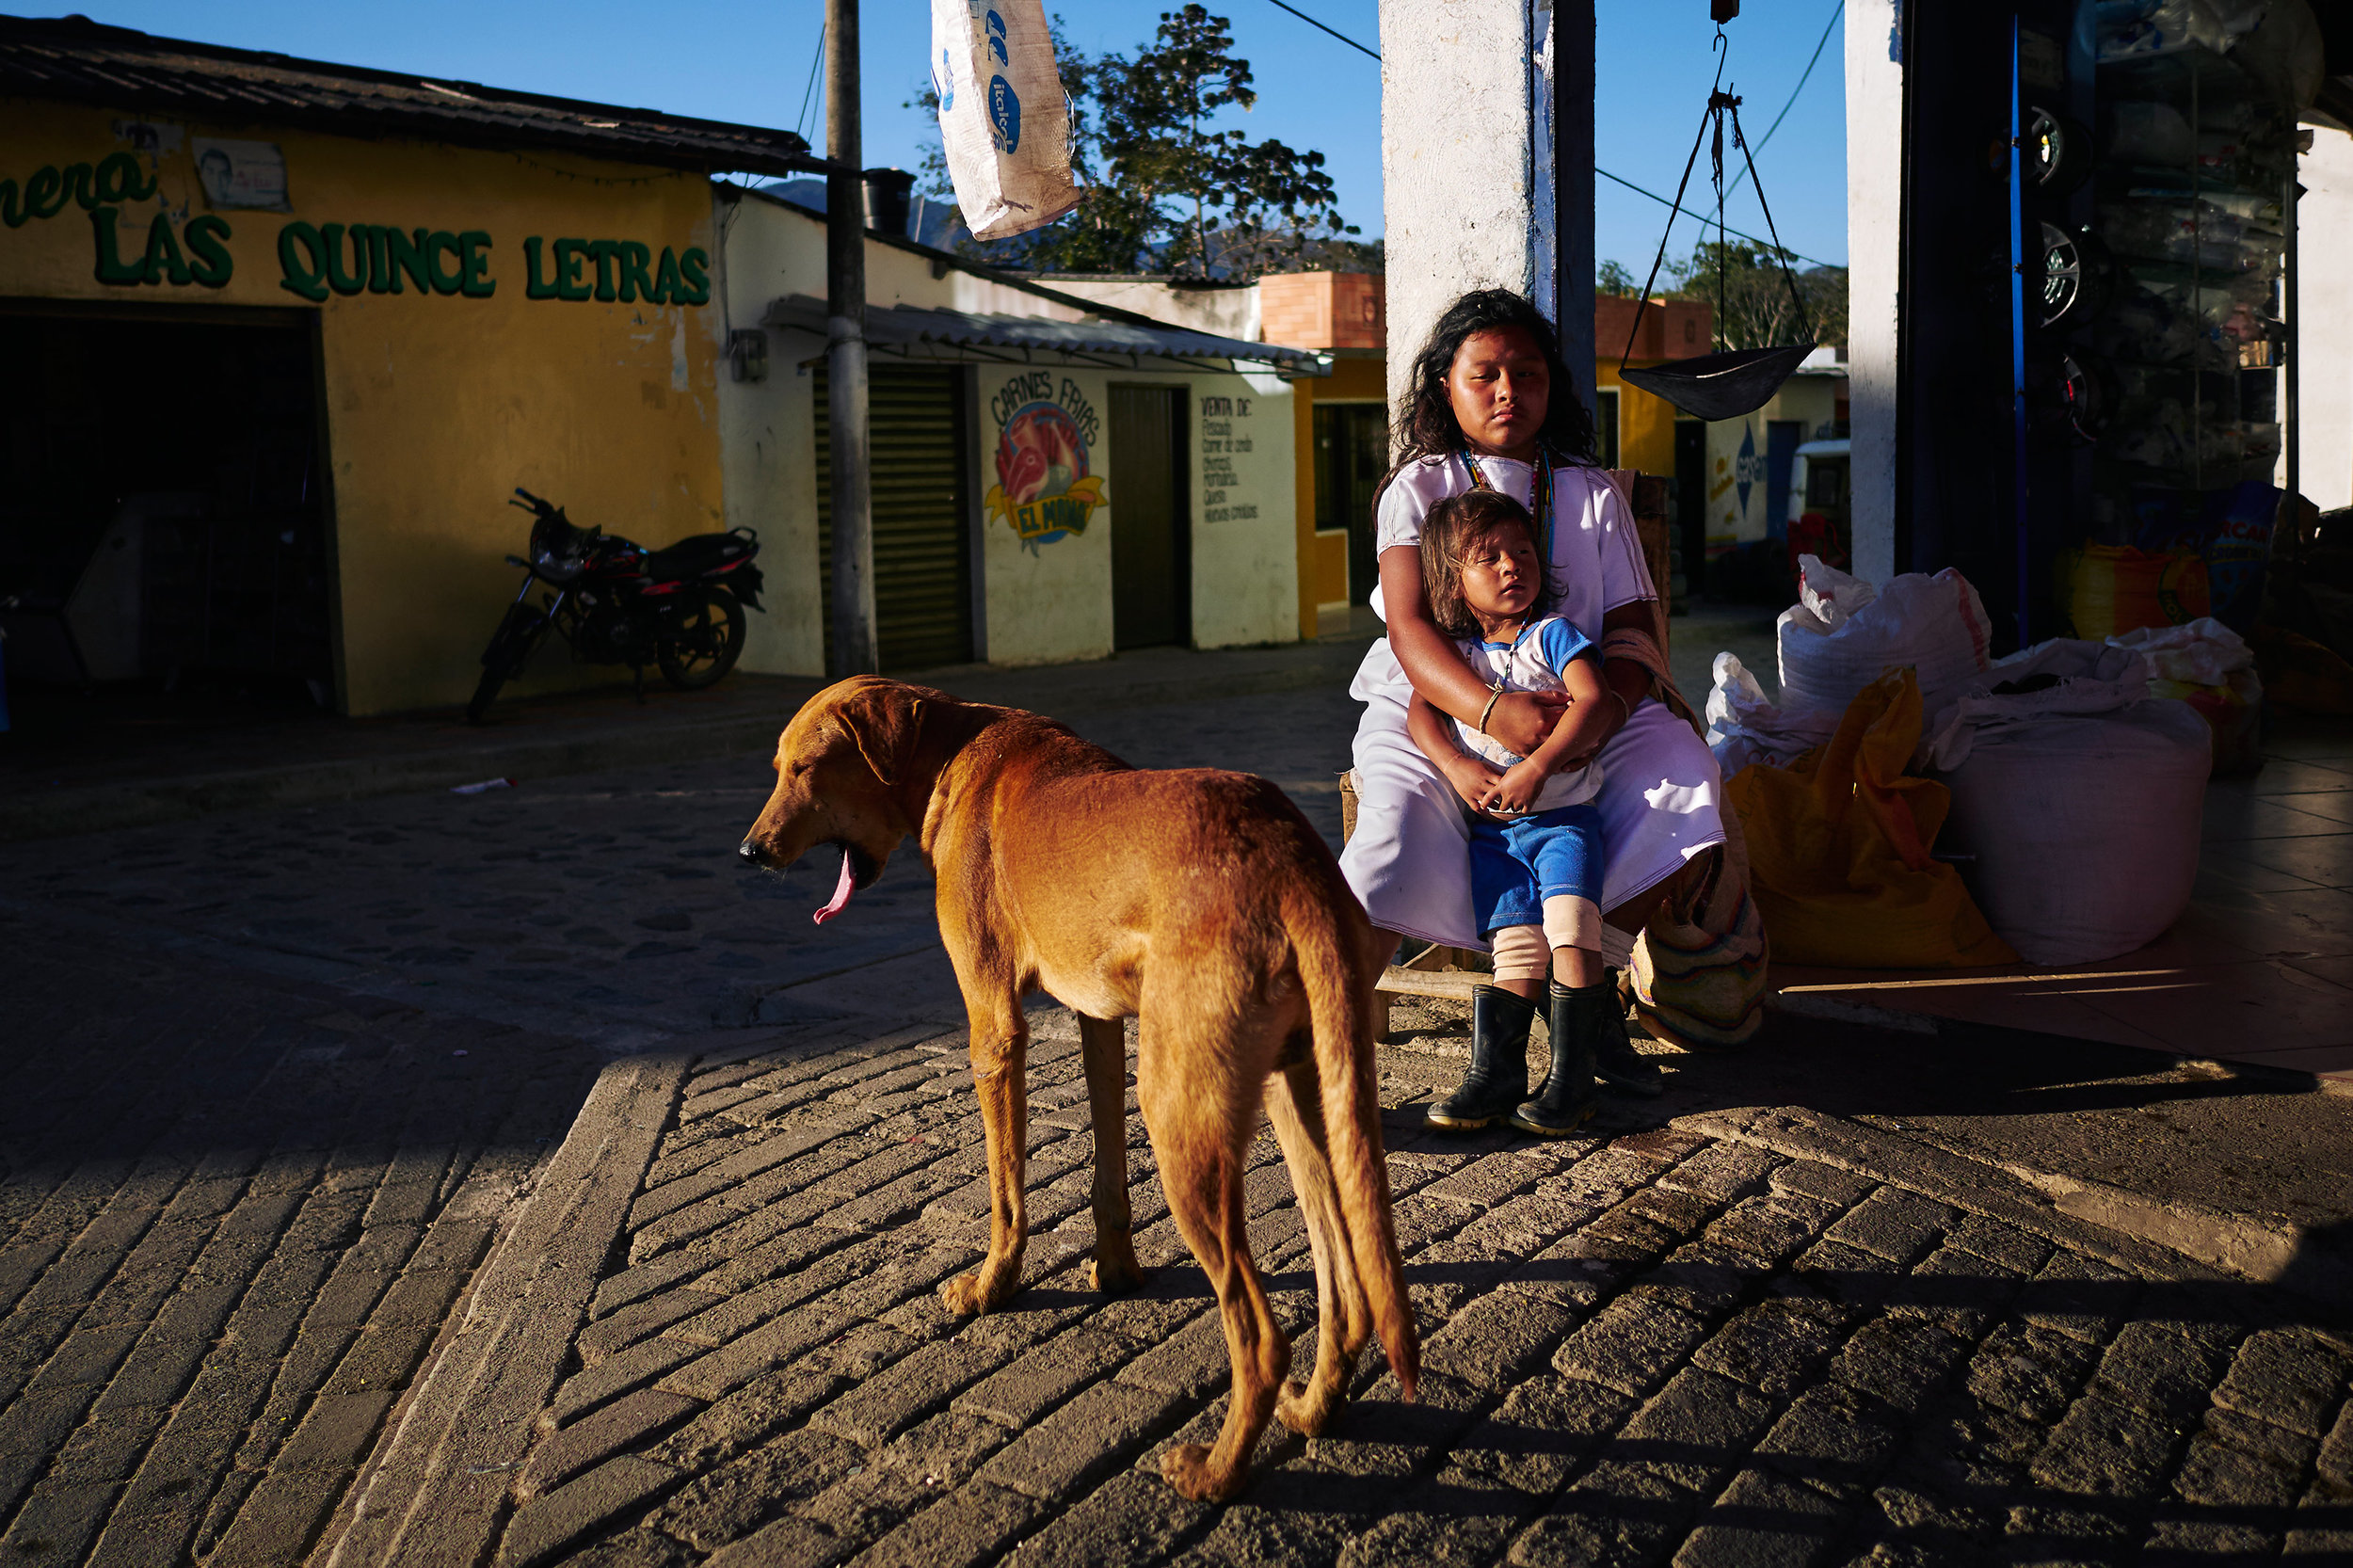 Arhuaco children waiting on the street of Pueblo Bello.